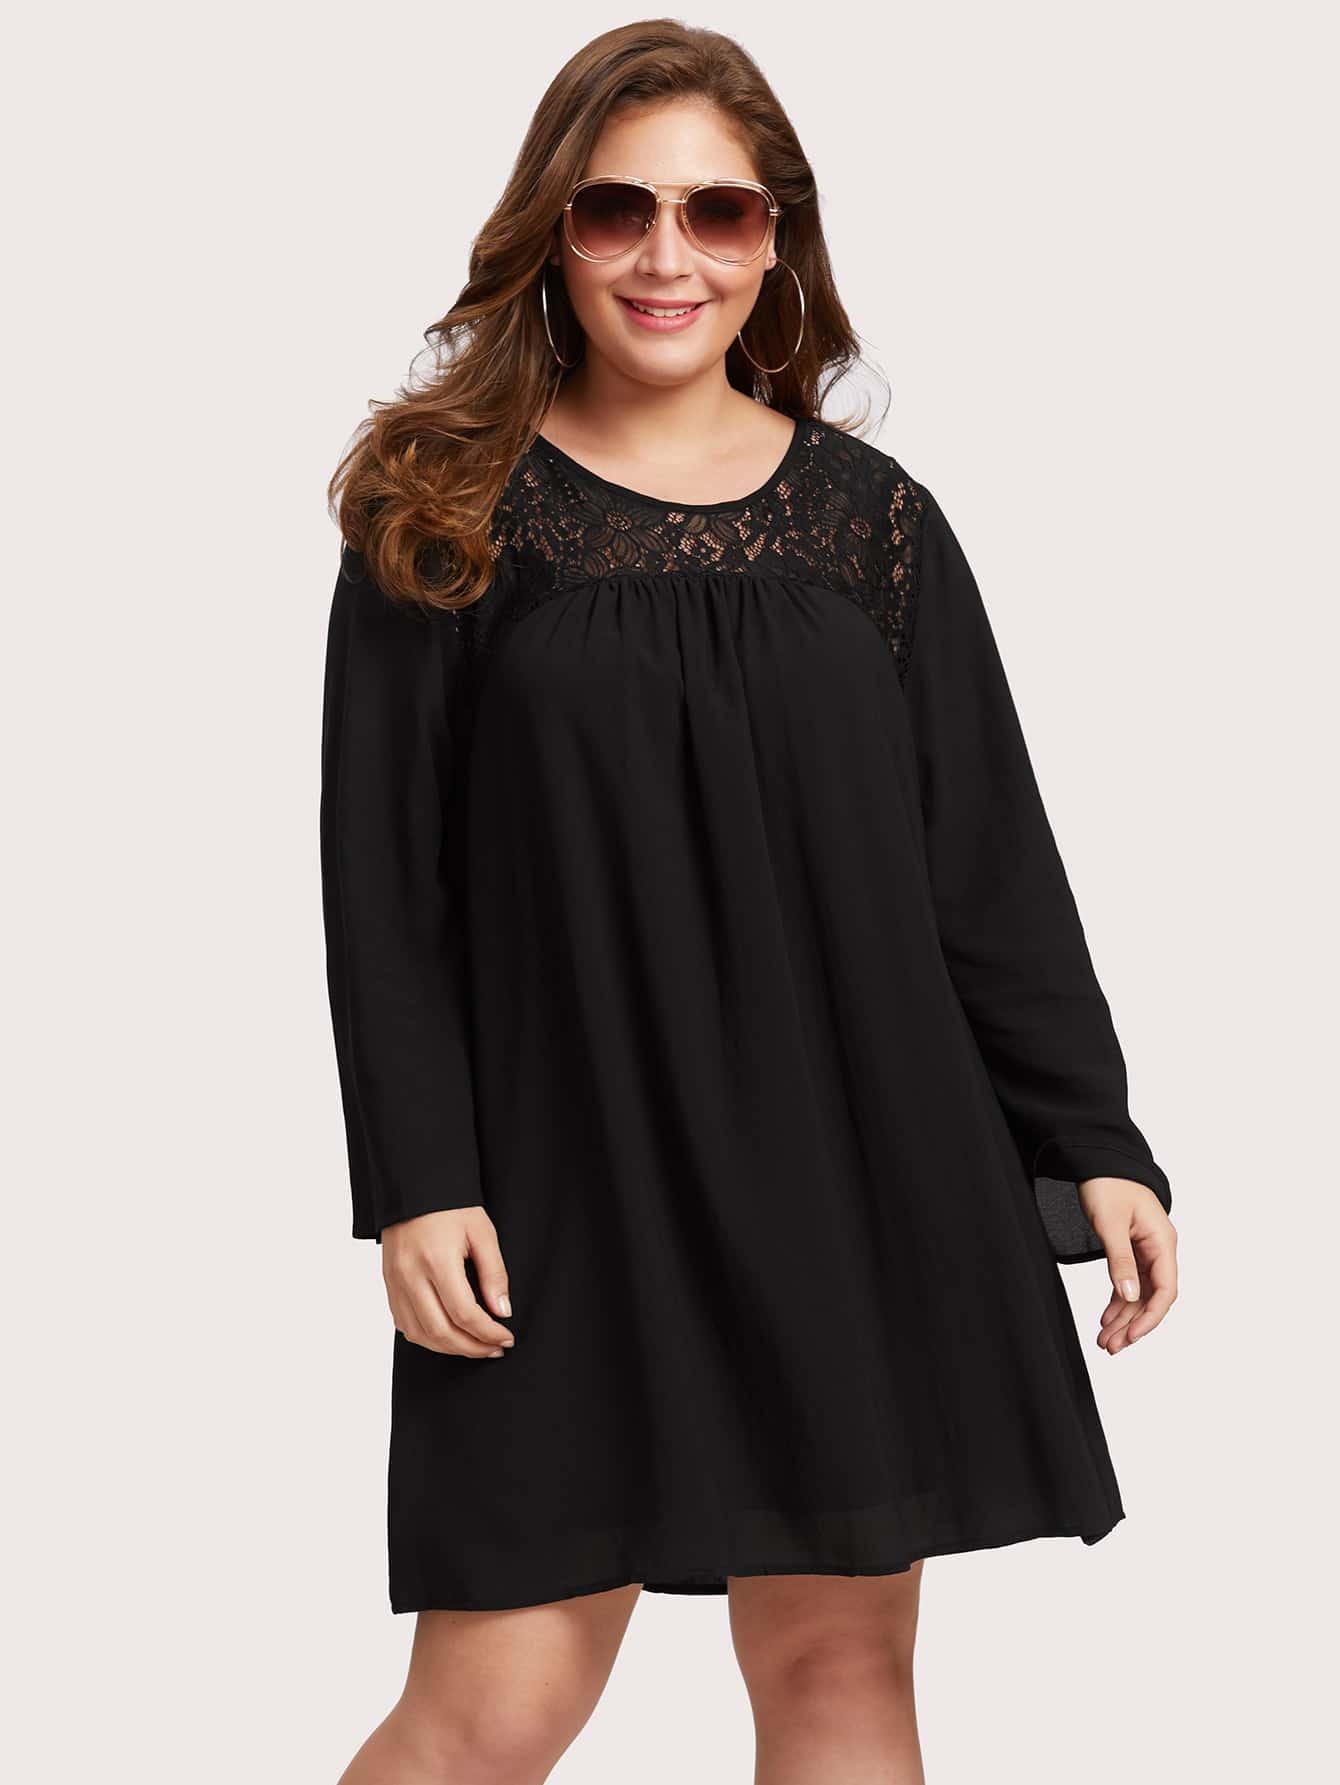 Lace Panel Oversized Dress mesh panel layered oversized sleeve dress